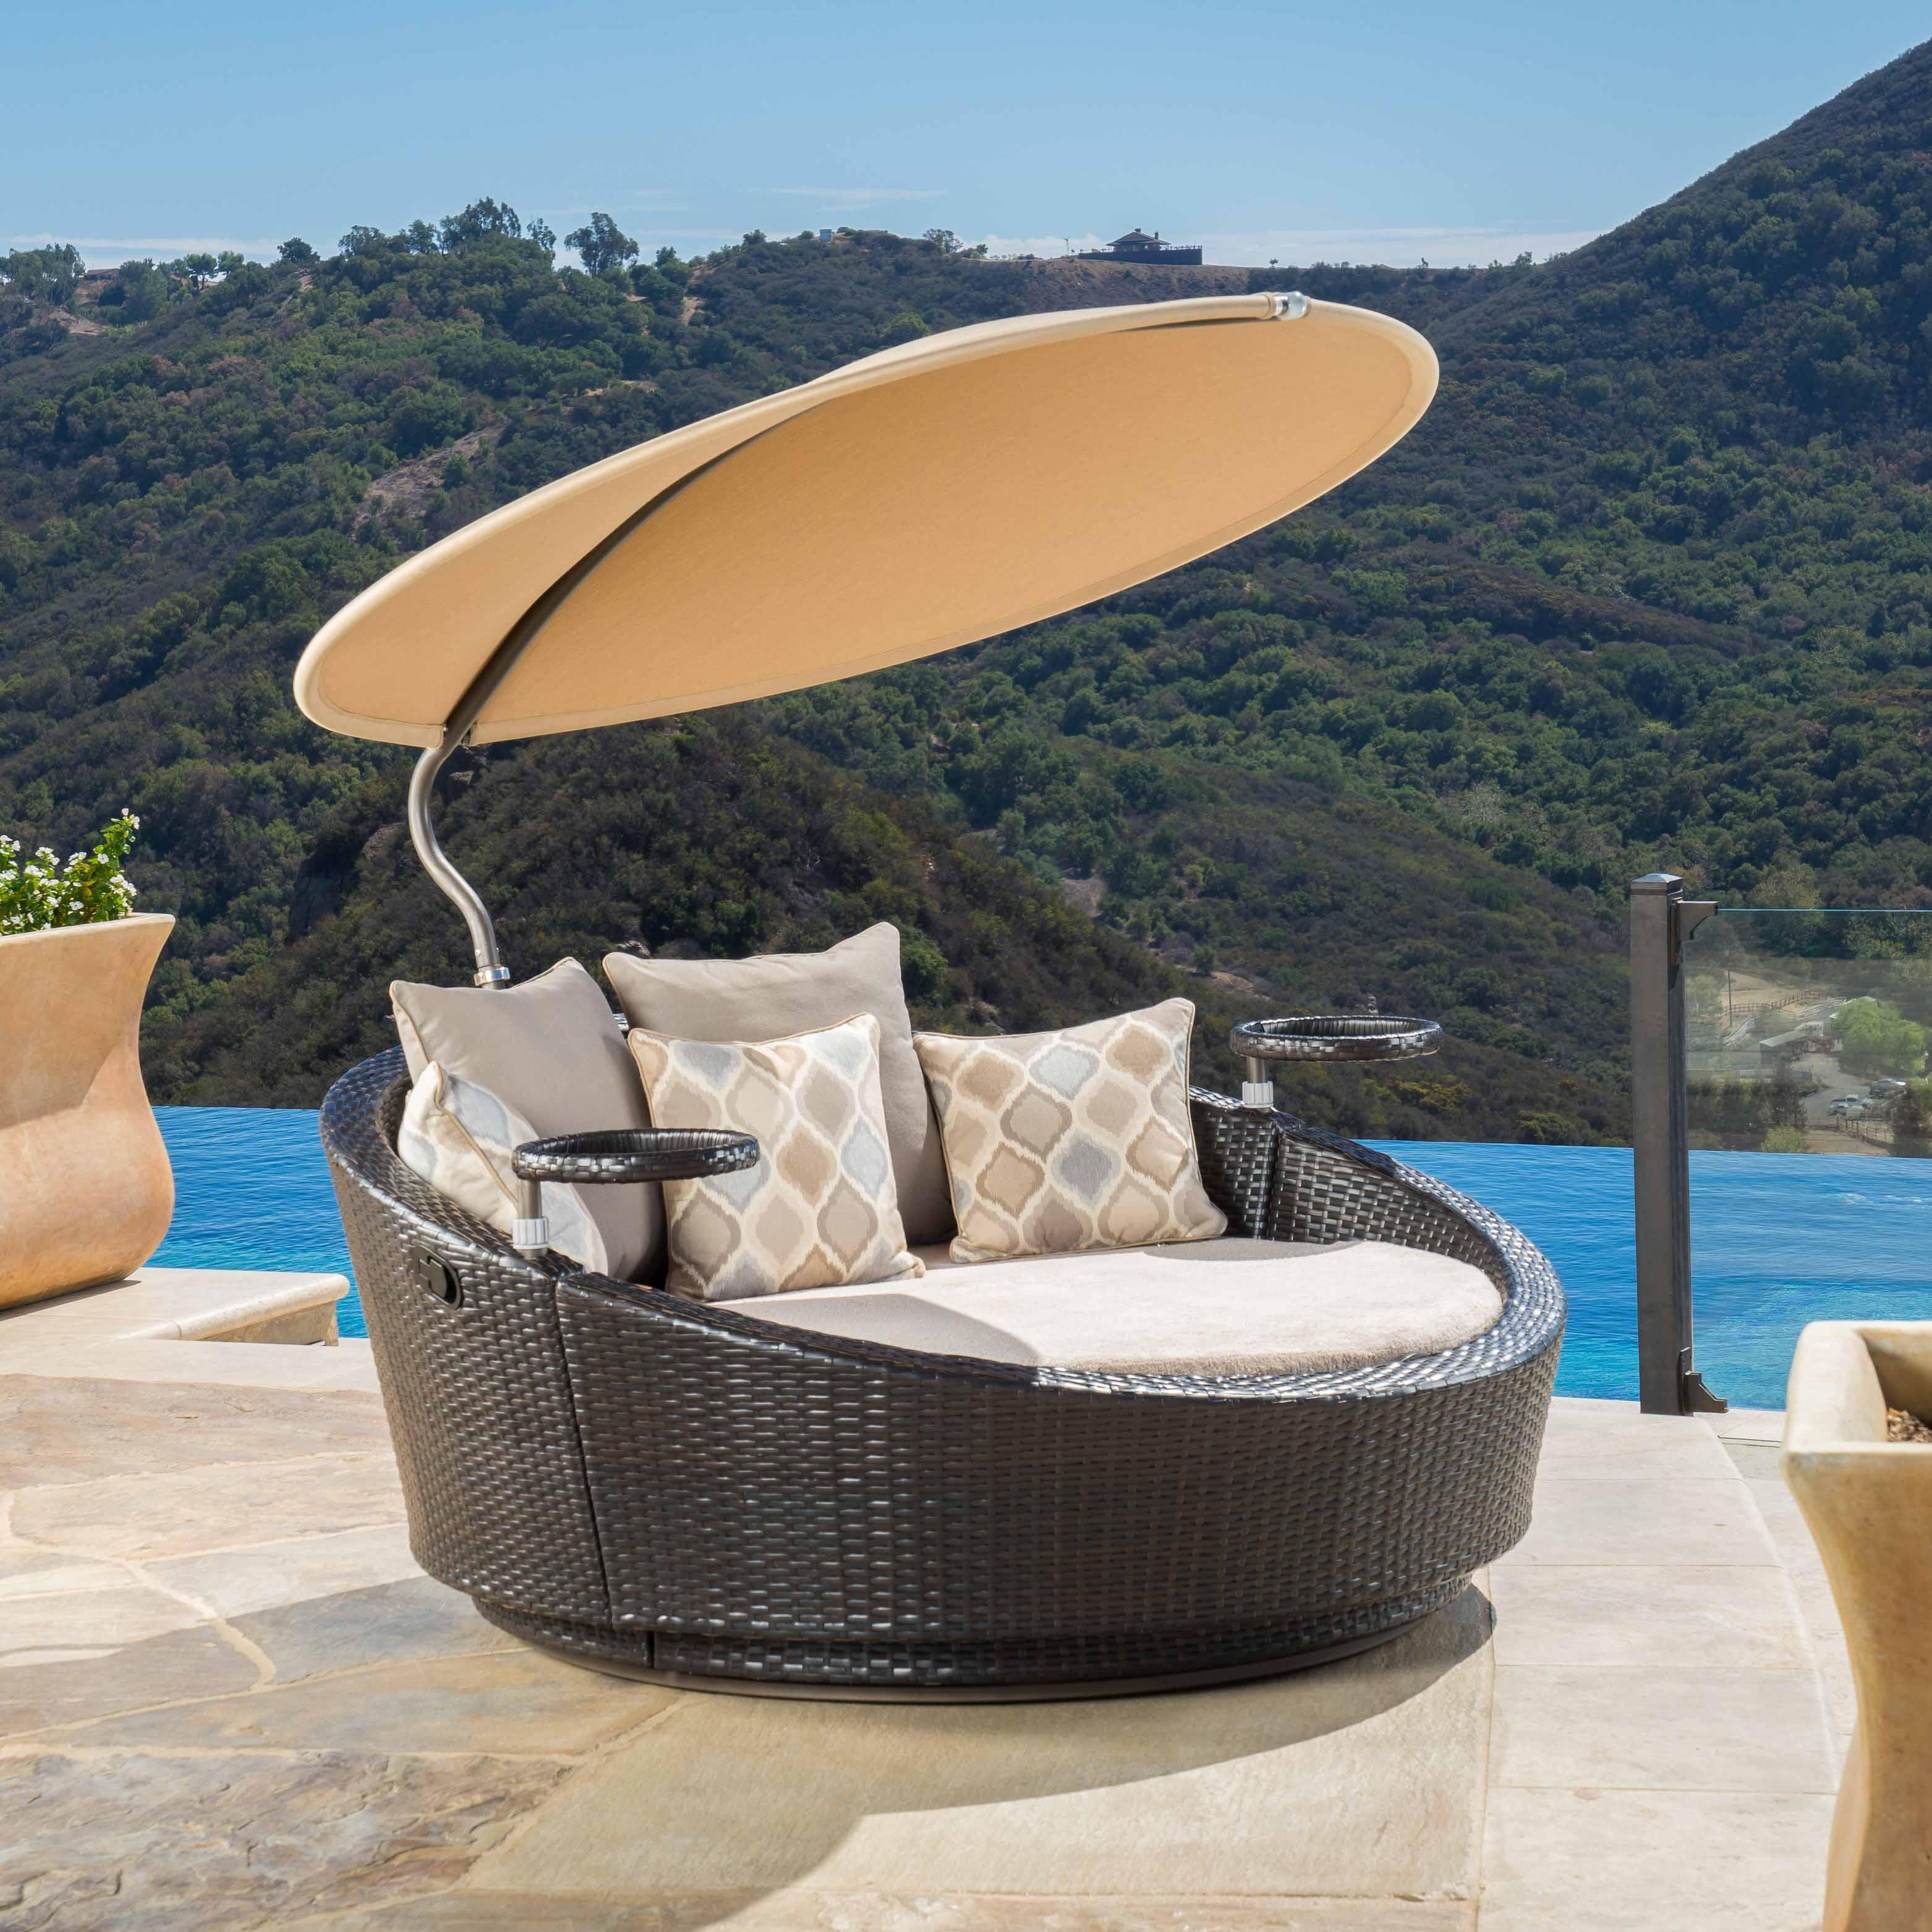 portofino comfort sundial day bed heather beige - Rst Brands